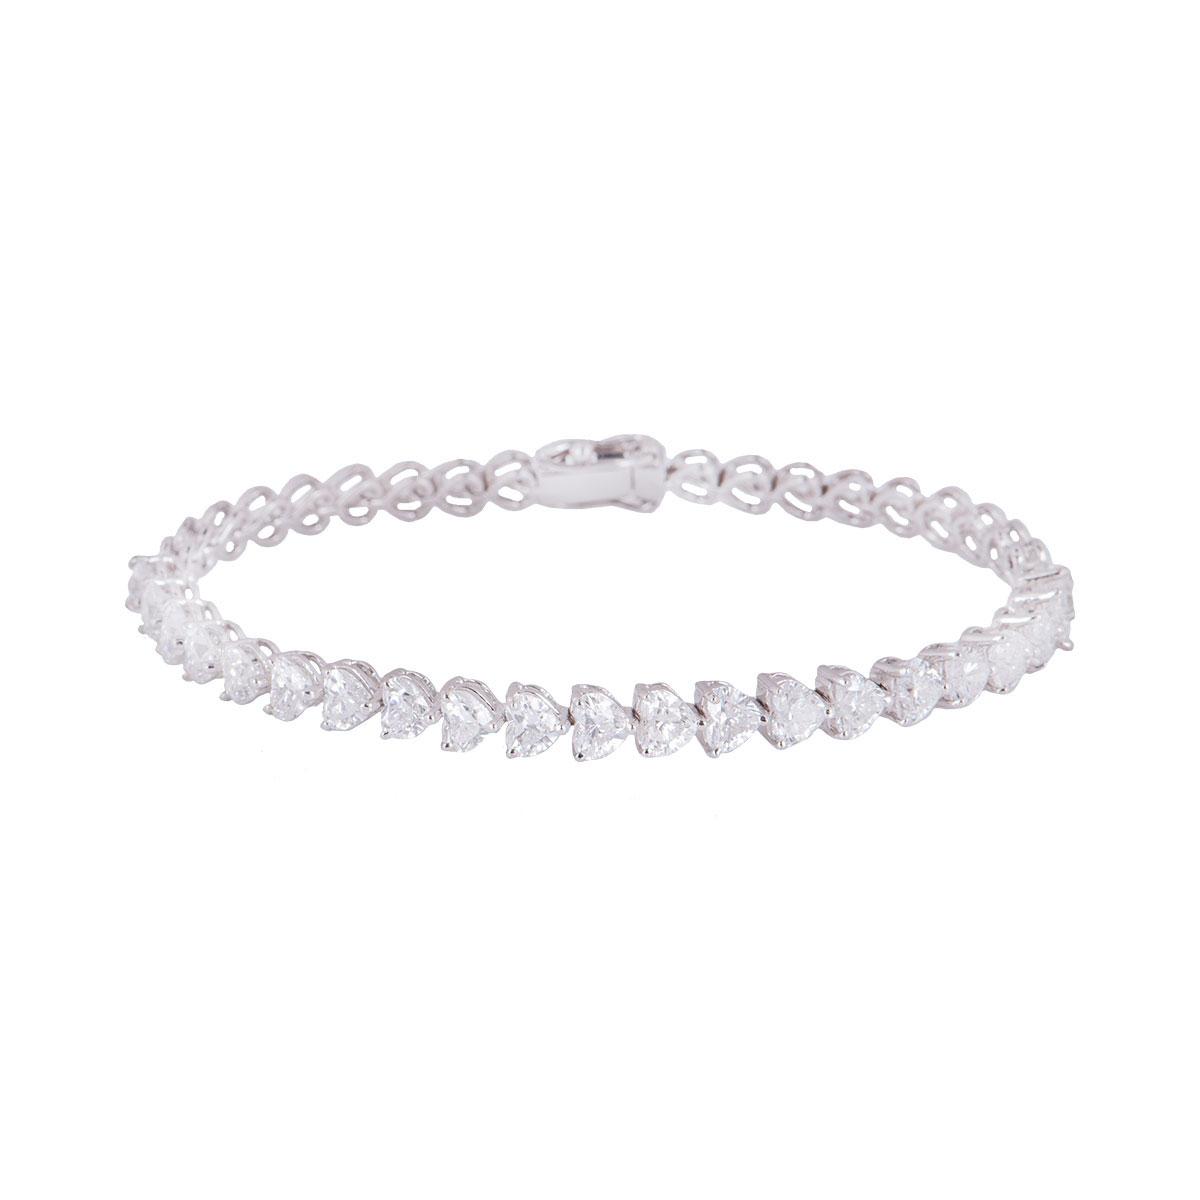 White Gold Heart Cut Diamond Line Bracelet 5.15ct